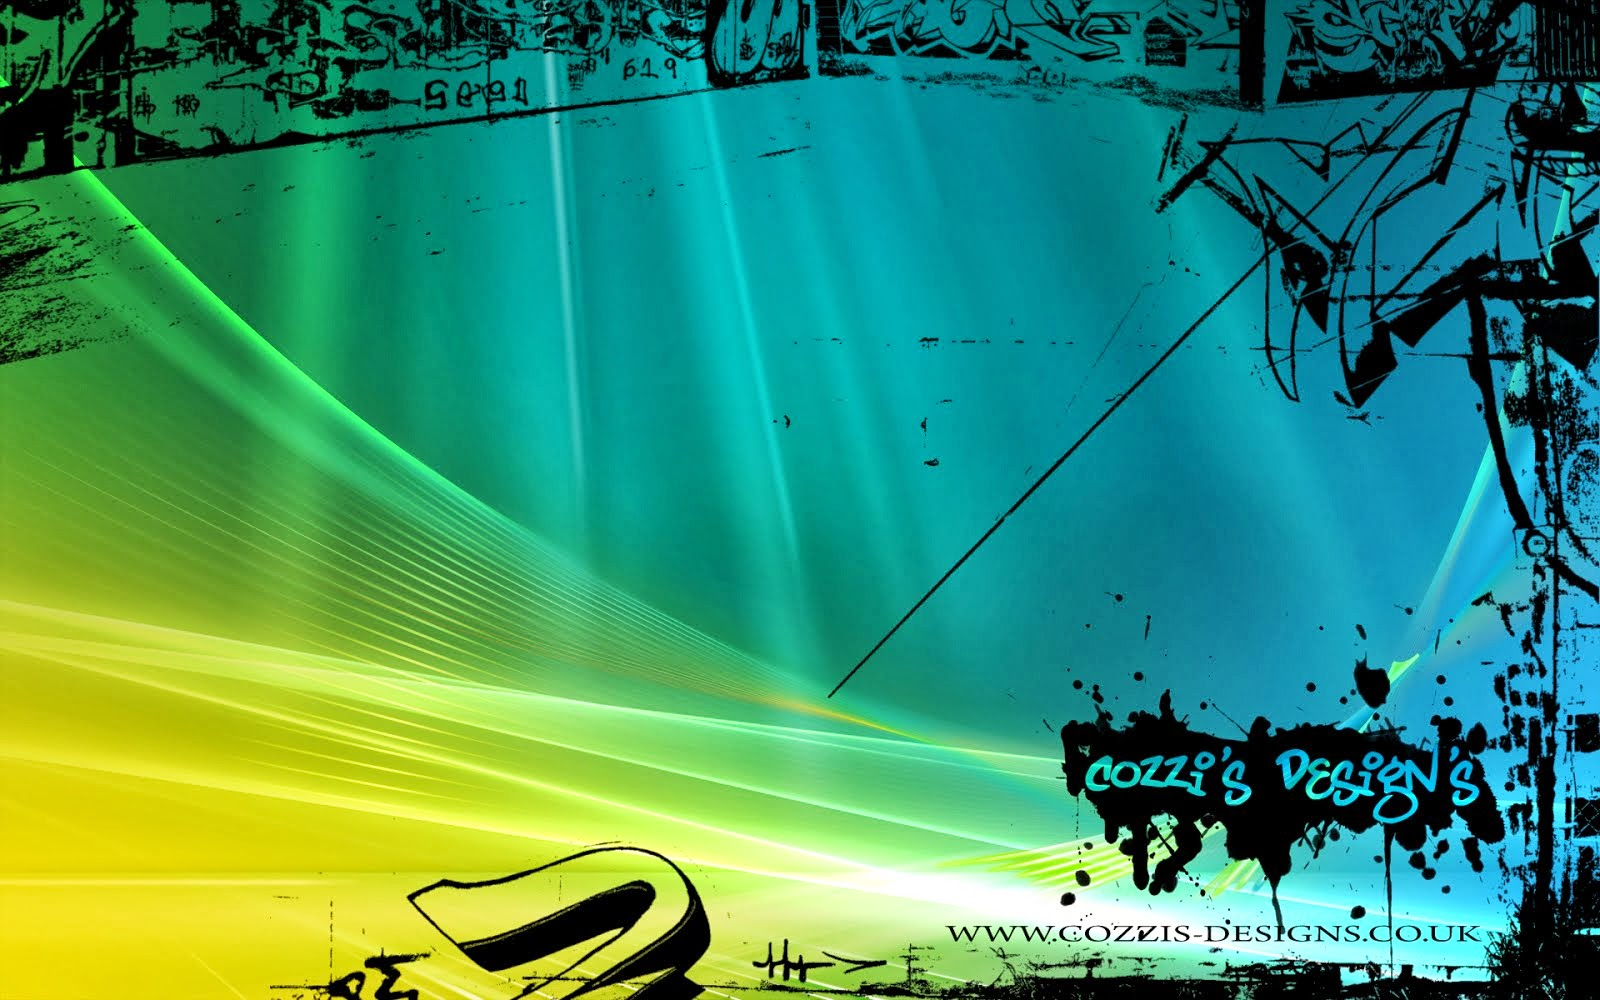 Animated Wallpaper Windows 7